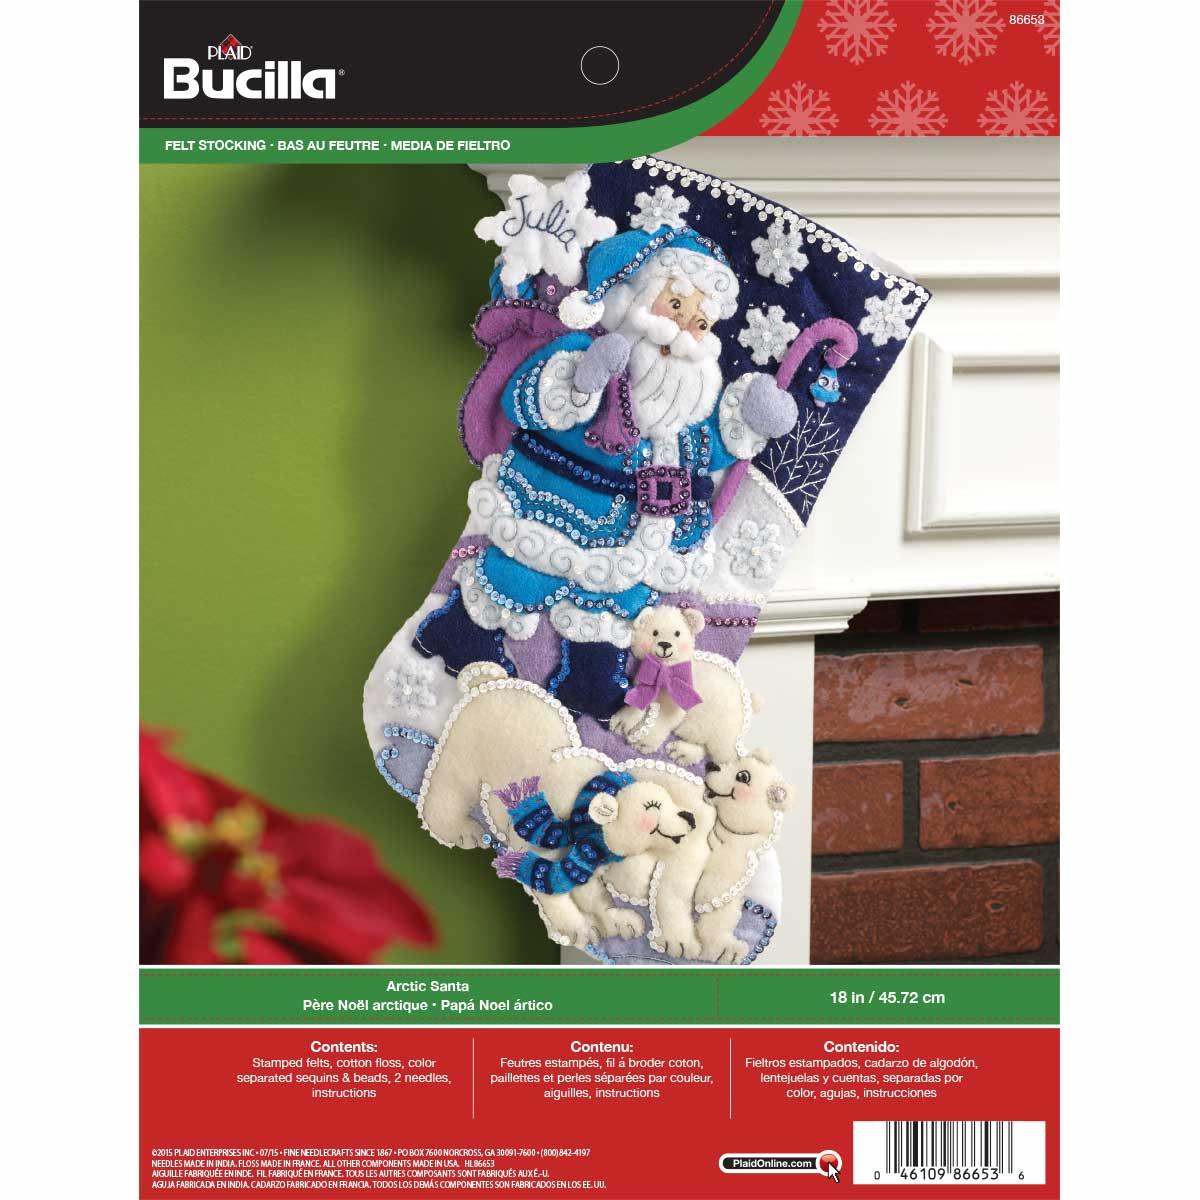 Bucilla ® Seasonal - Felt - Stocking Kits - Arctic Santa